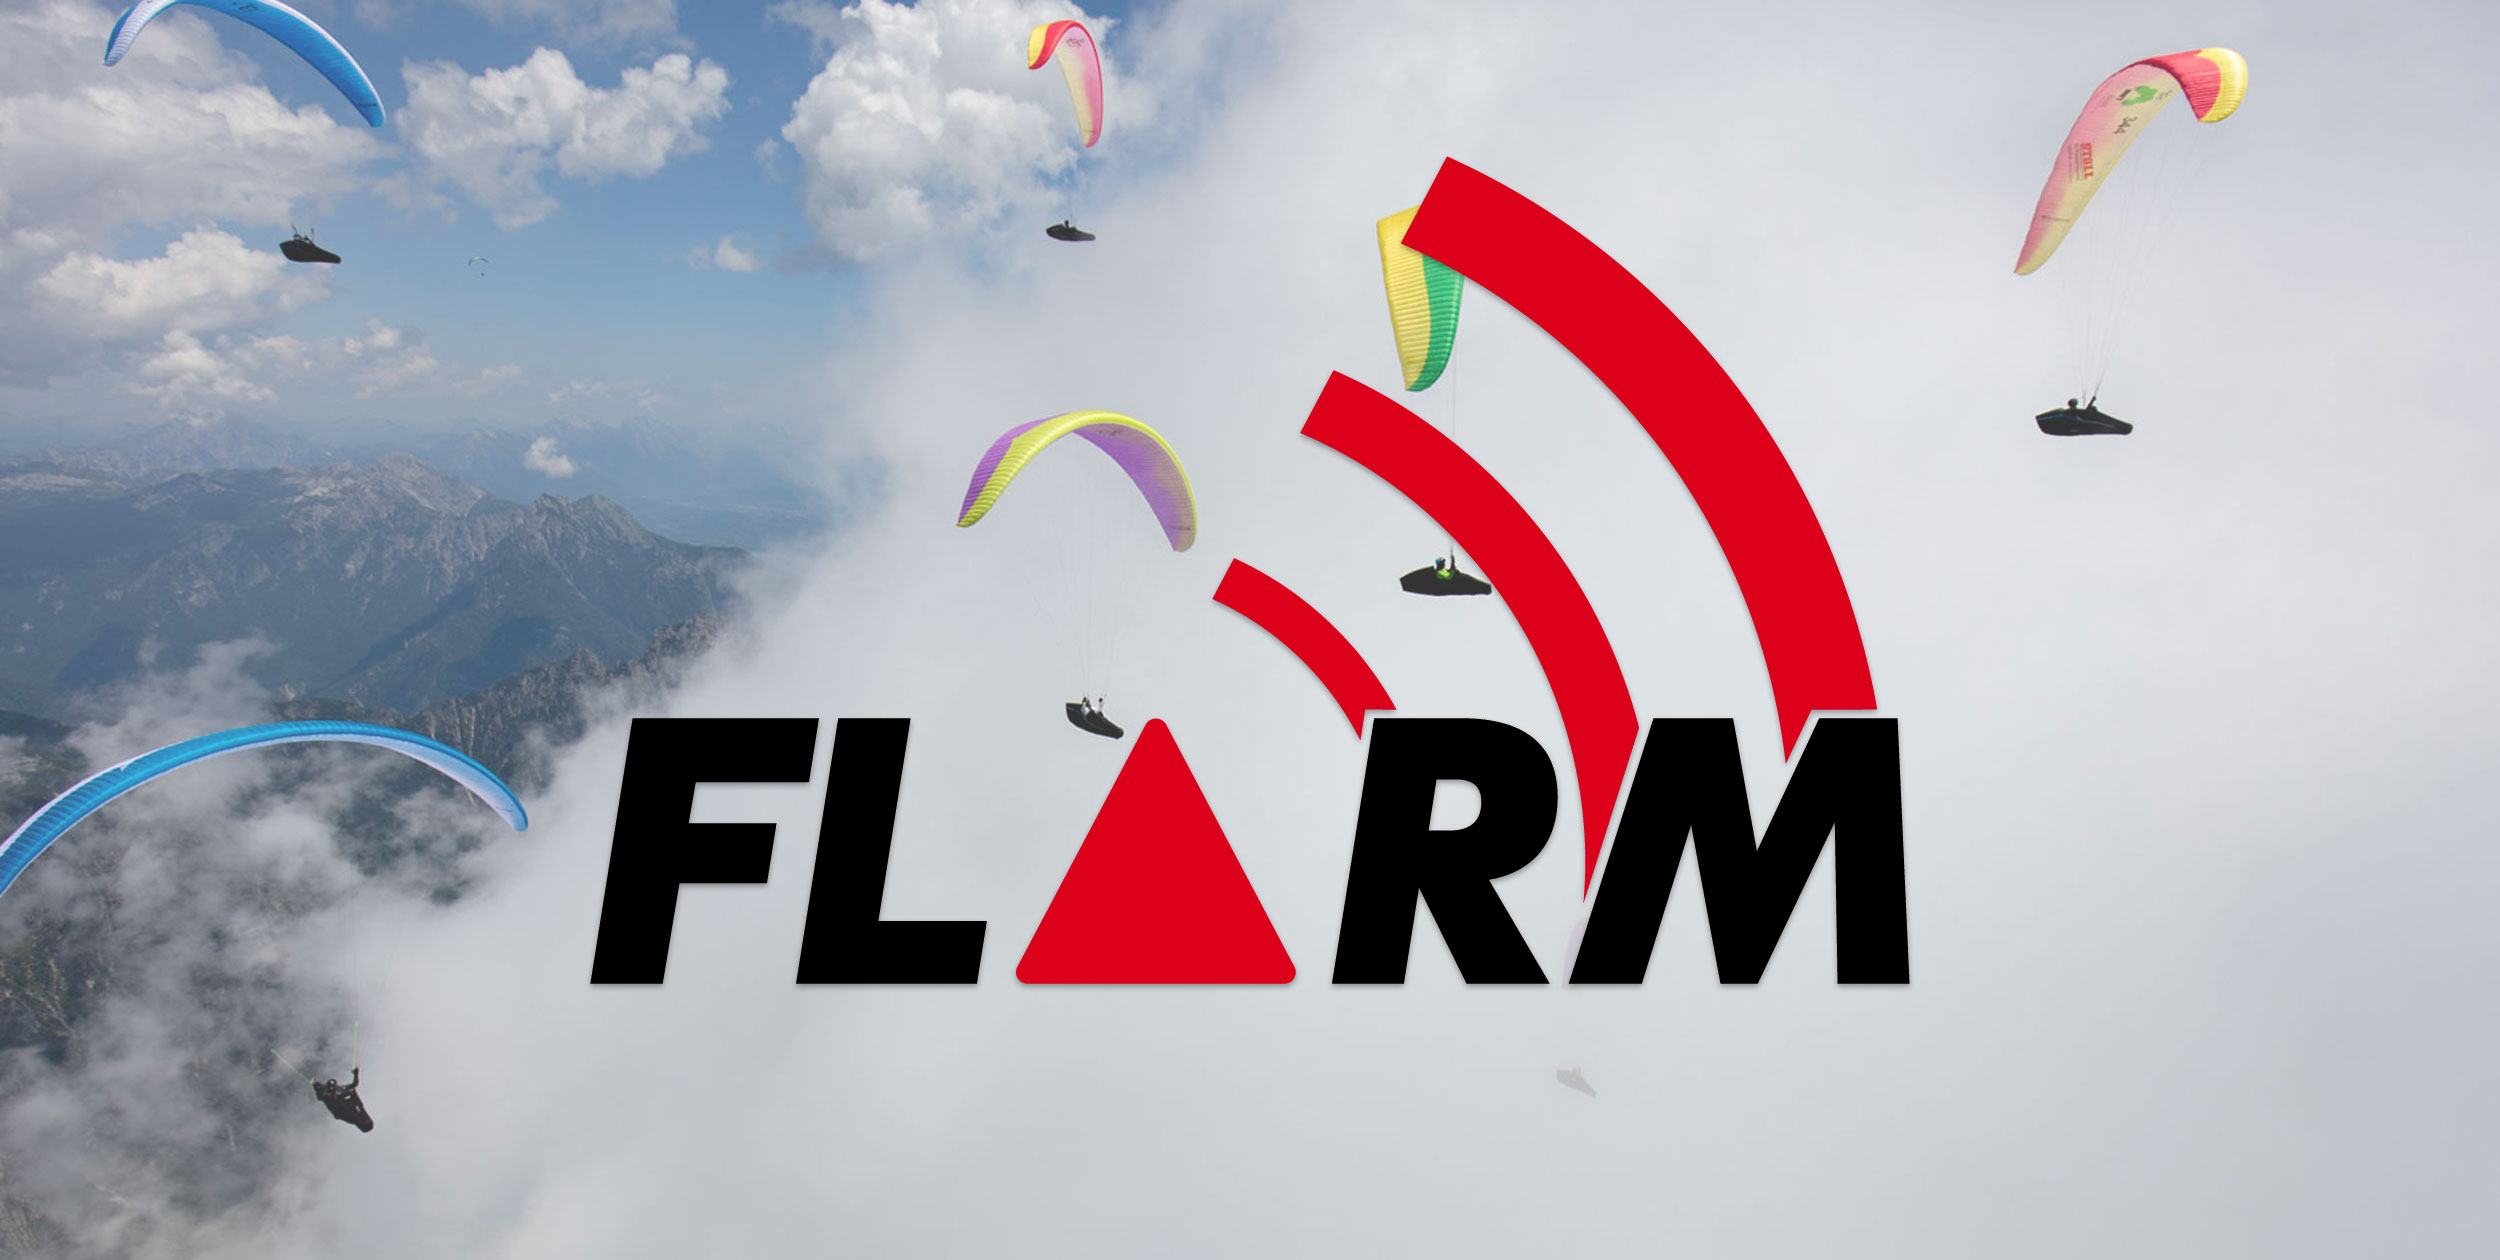 Flarm logo